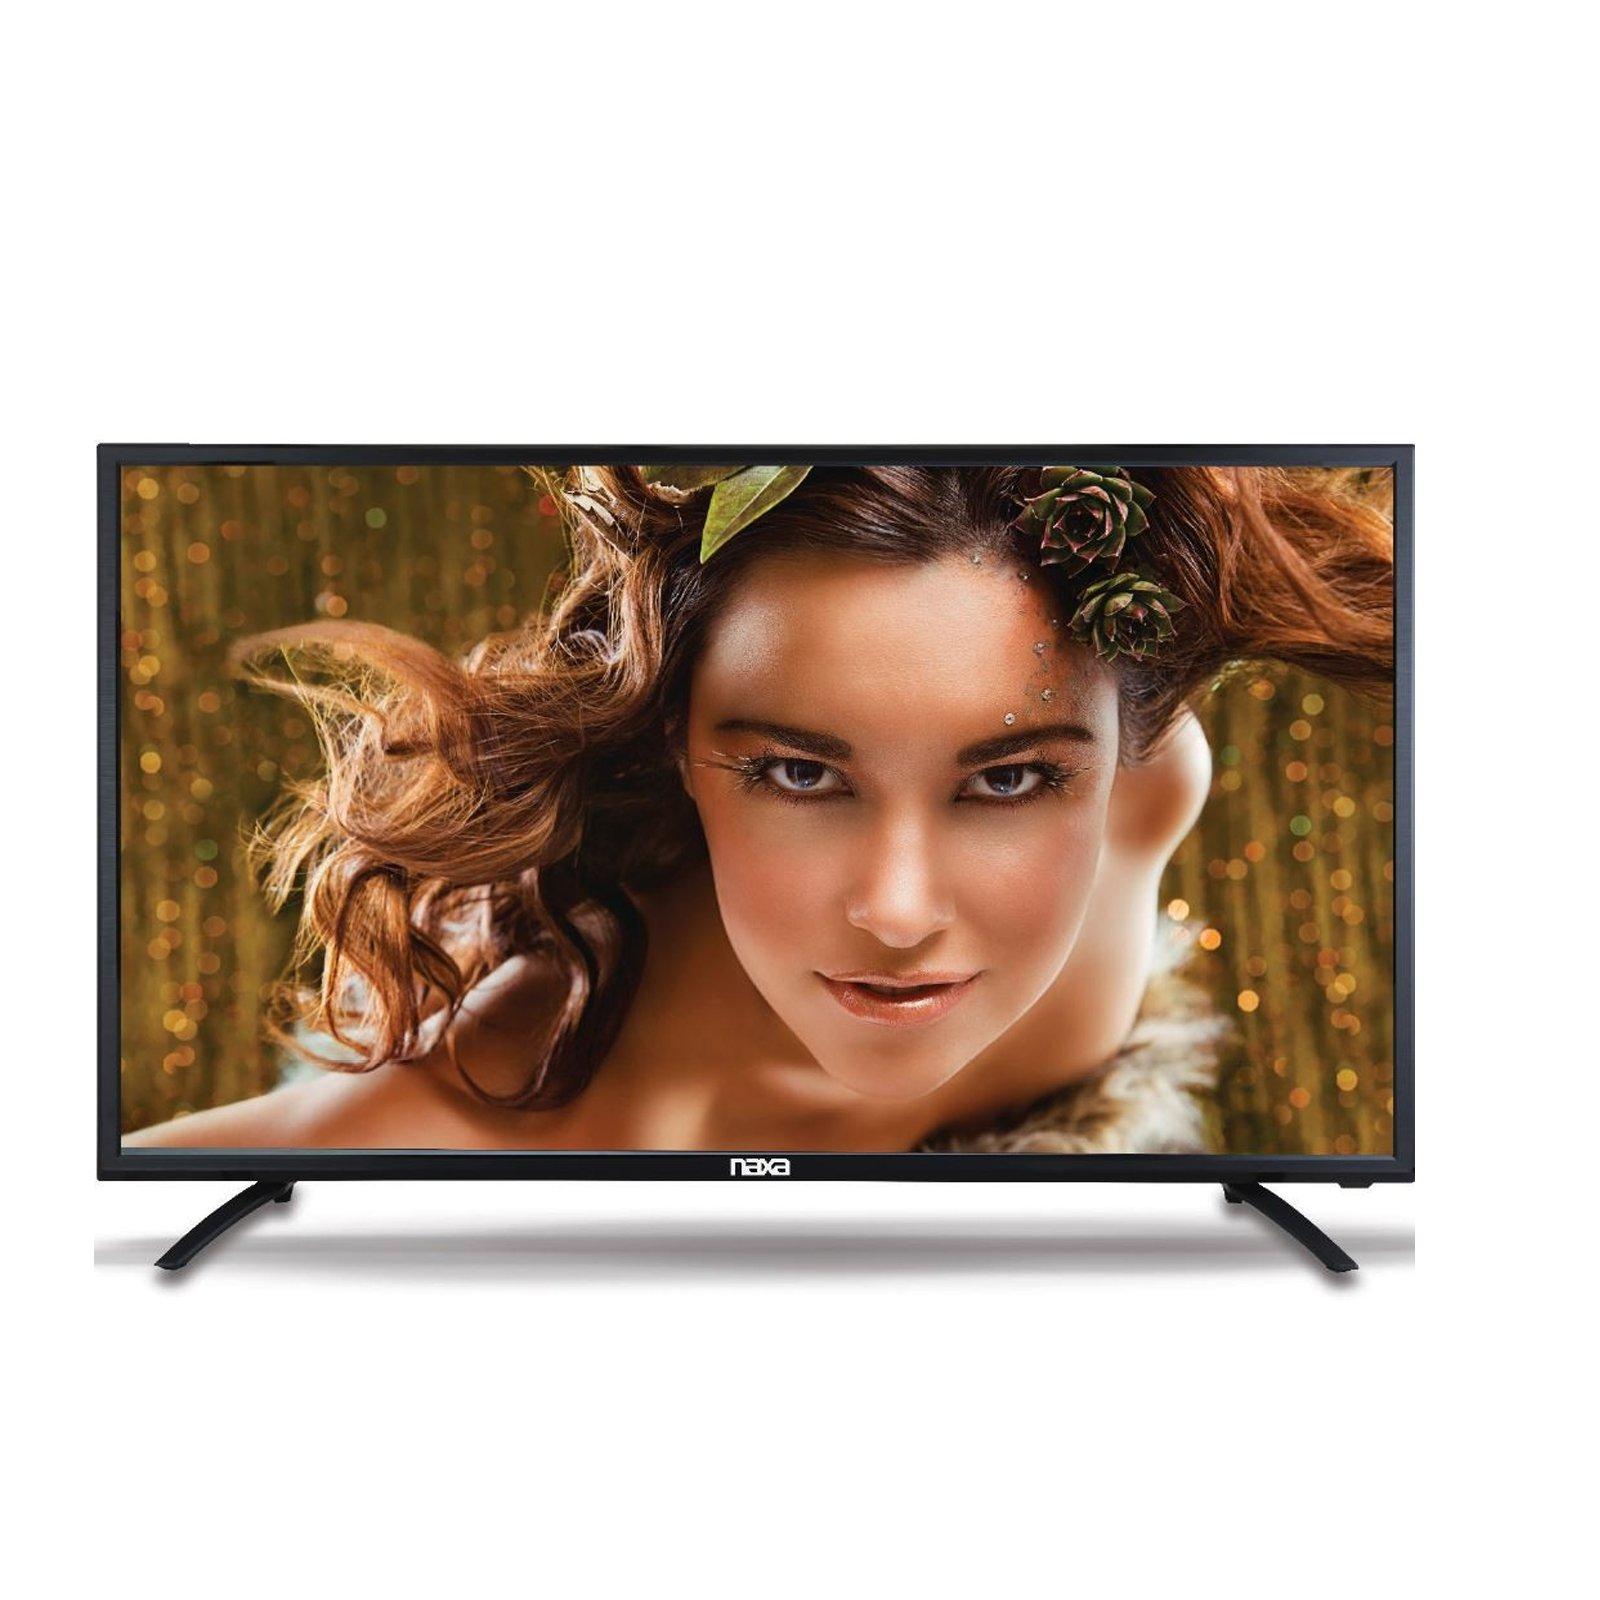 NAXA Electronics NTD-2457 Class LED TV/DVD/Media Player/Car Package, 72p HD on 1366 x 768 Resolution, Supports USB/SD Cards, Wall Mountable, 24-Inch by Naxa Electronics